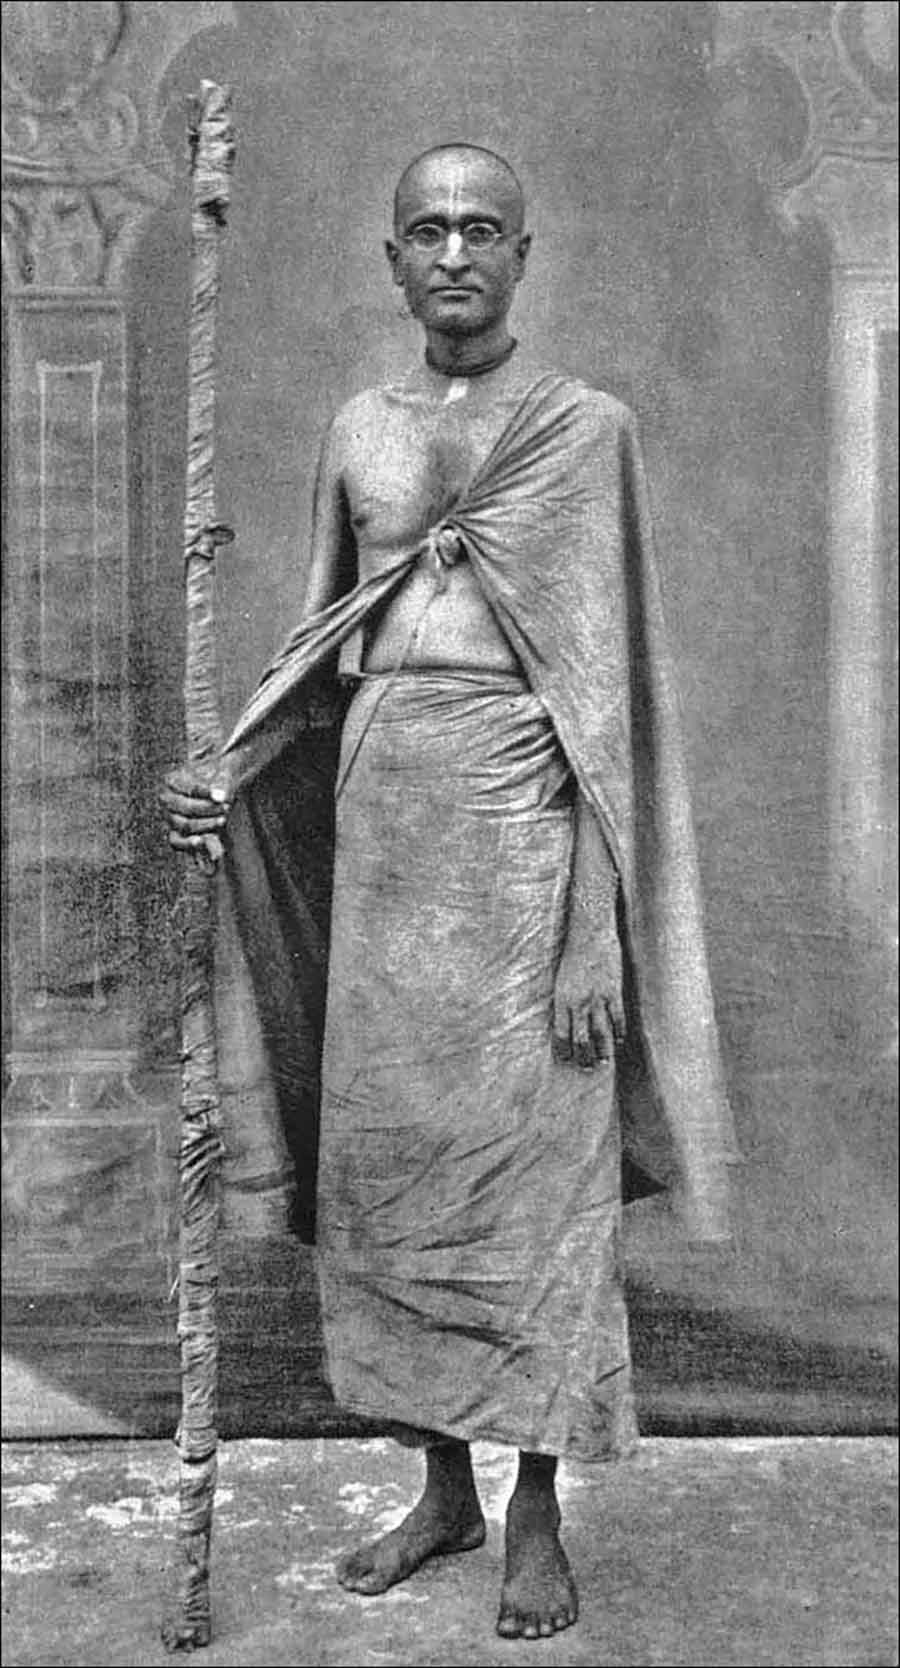 Шрила Бхактисиддханта Сарасвати Госвами